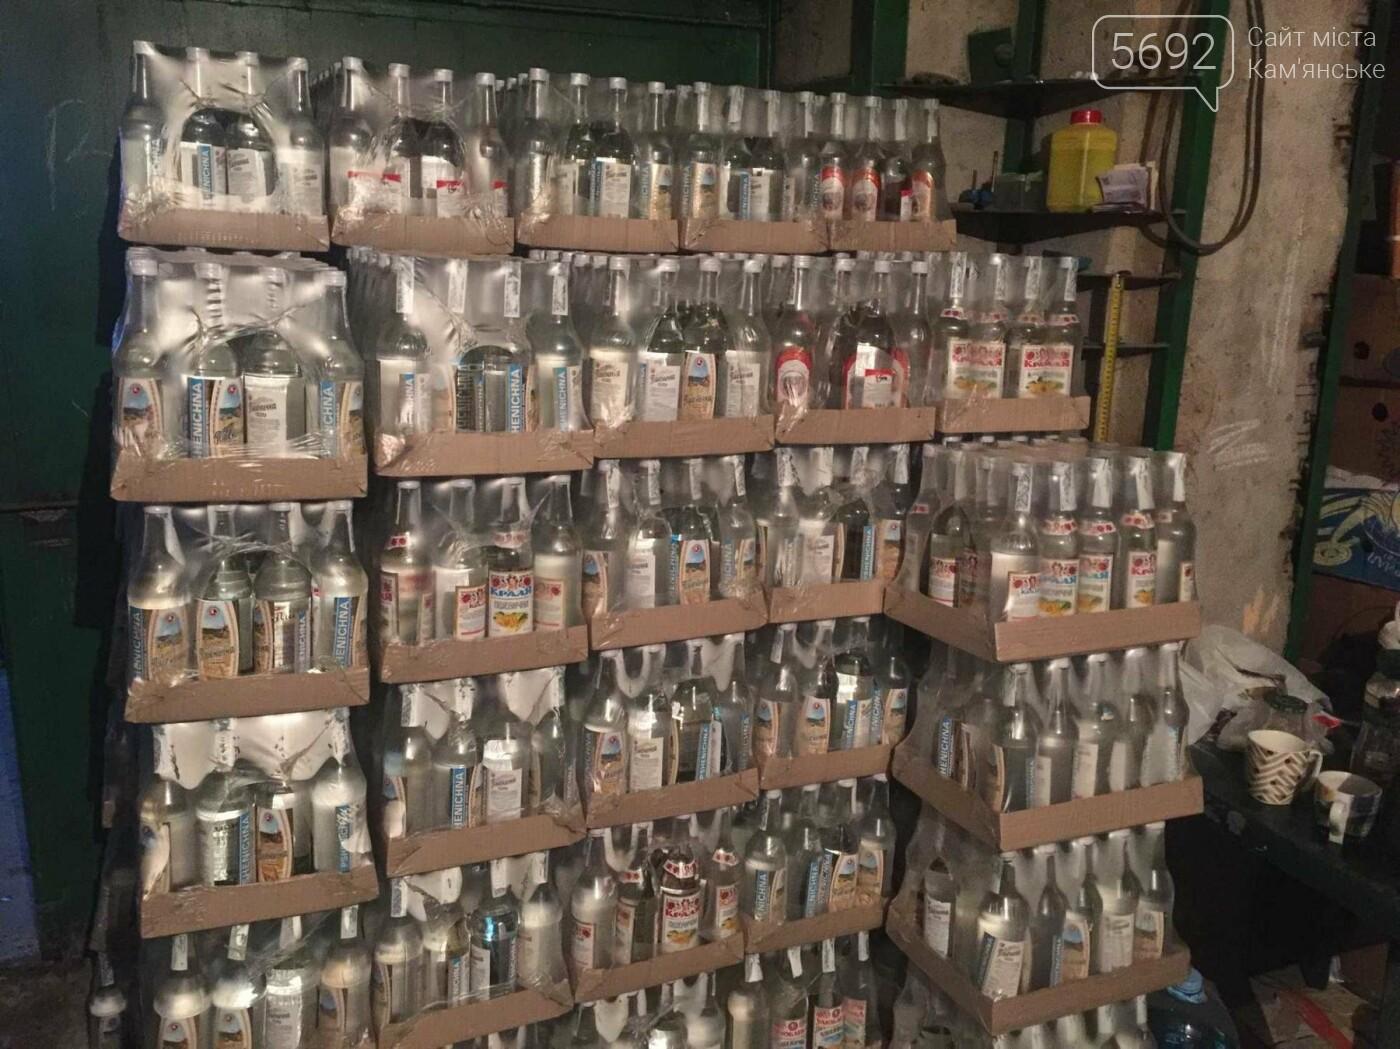 Прокуратура и полиция Каменского изъяли паленую водку, фото-4